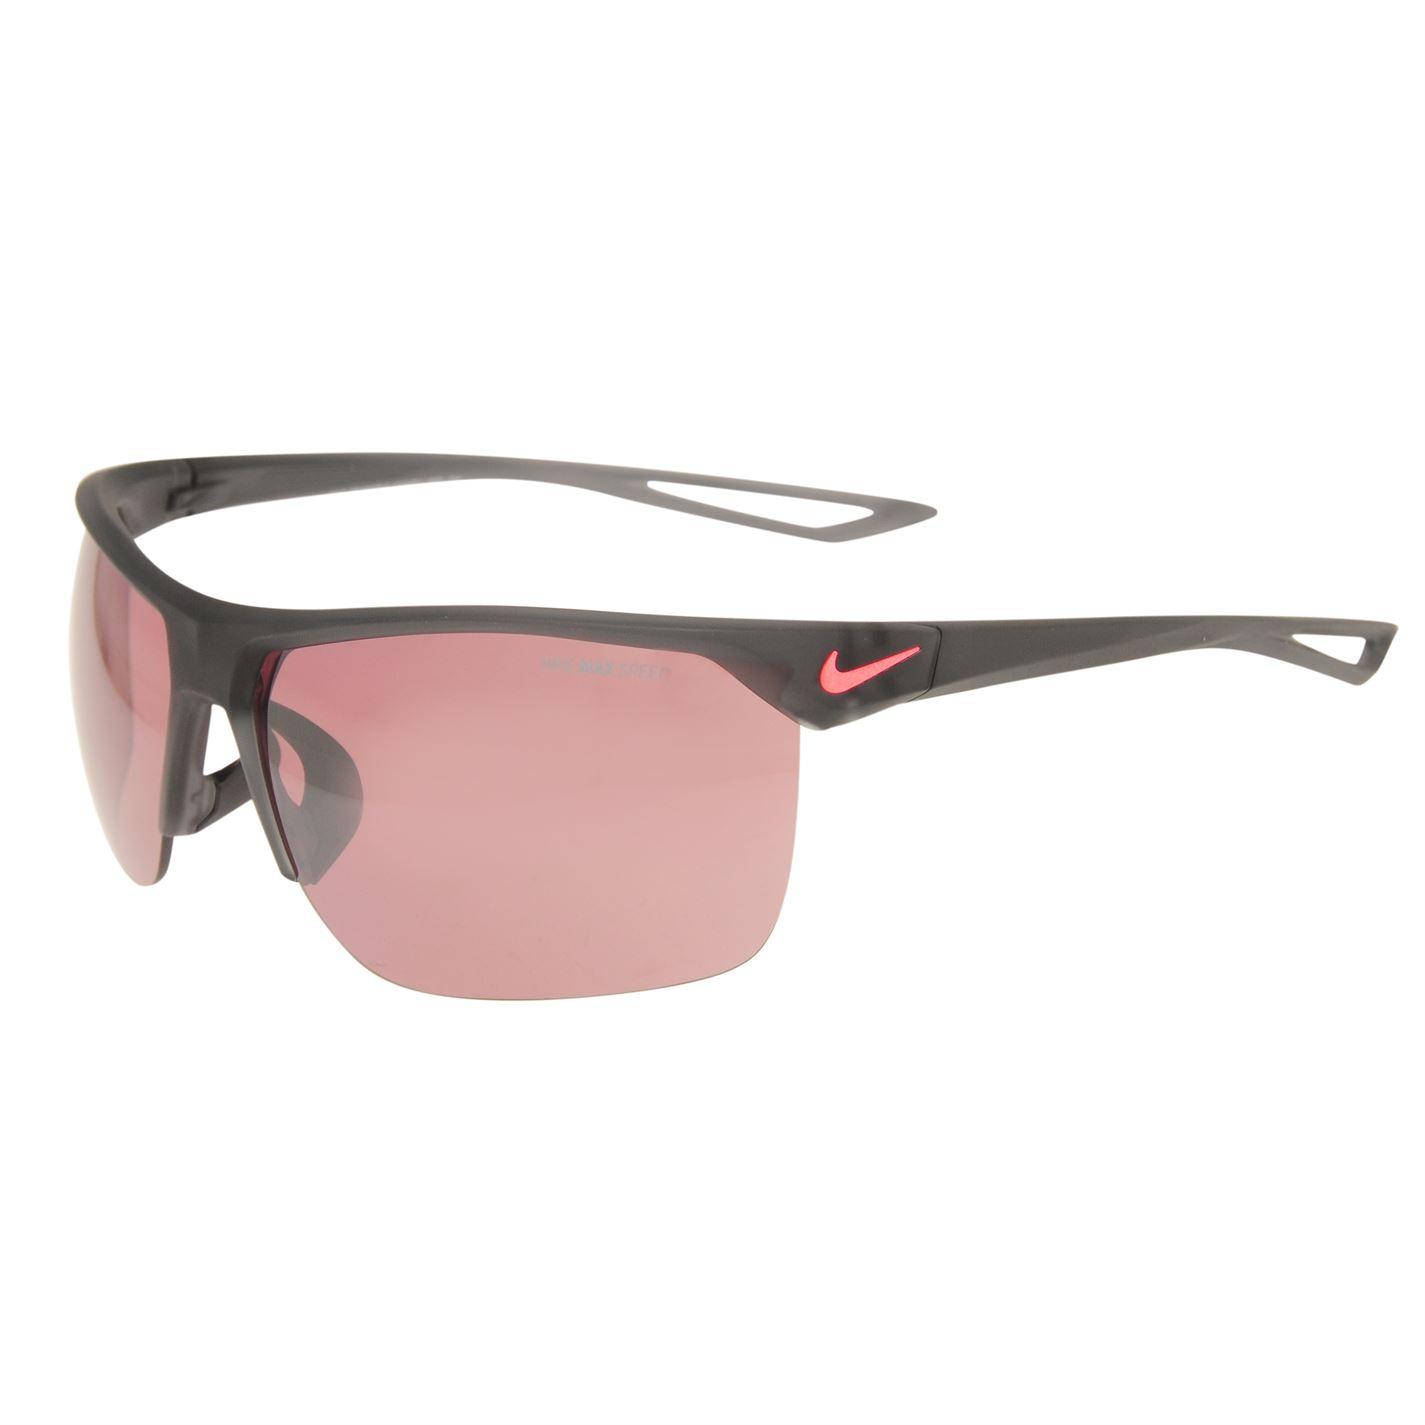 Nike E EV1014 Sunglasses